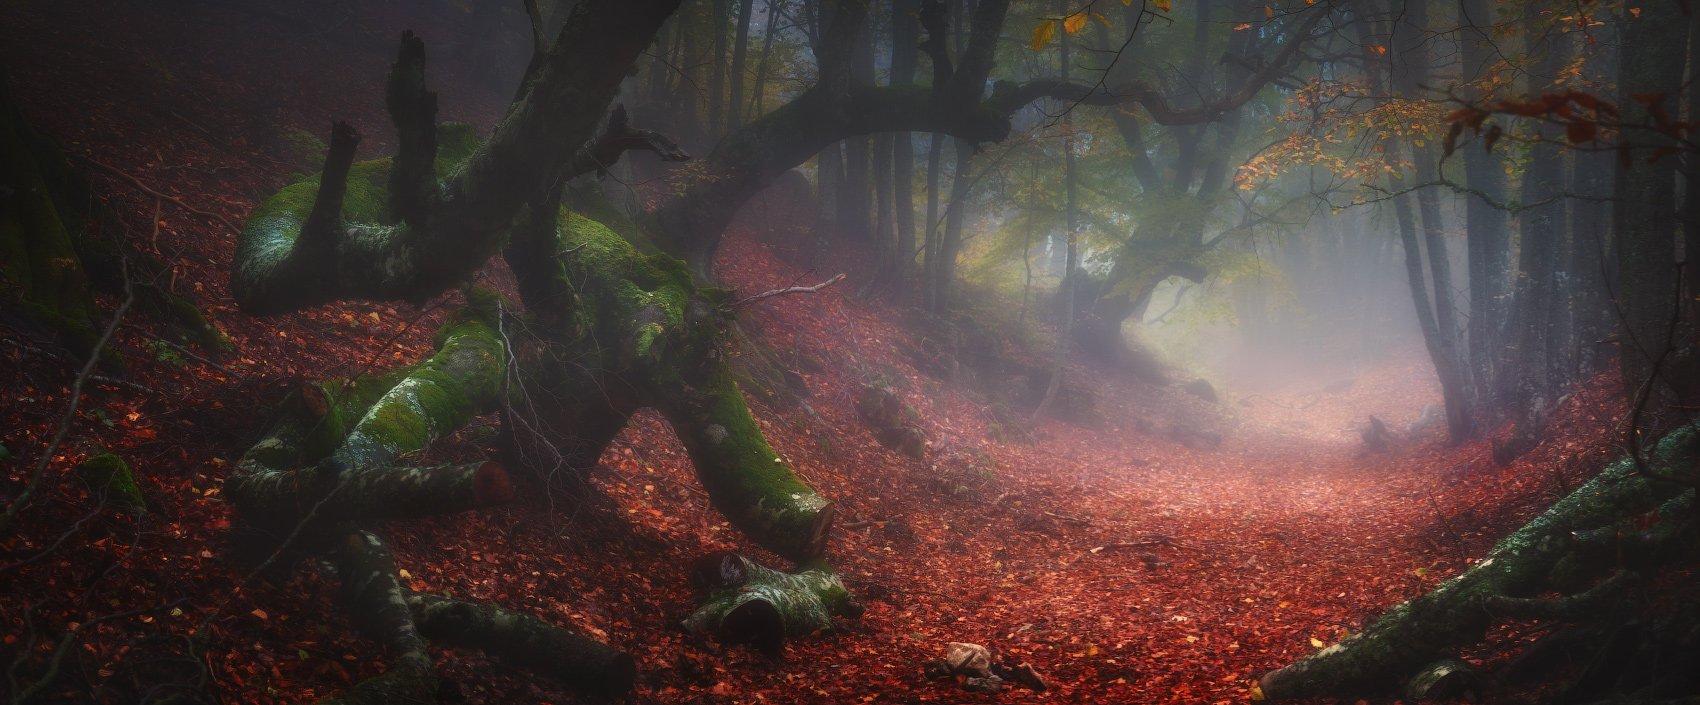 крым, демерджи, осень, лес, туман, Андрей Уляшев (Mercand)